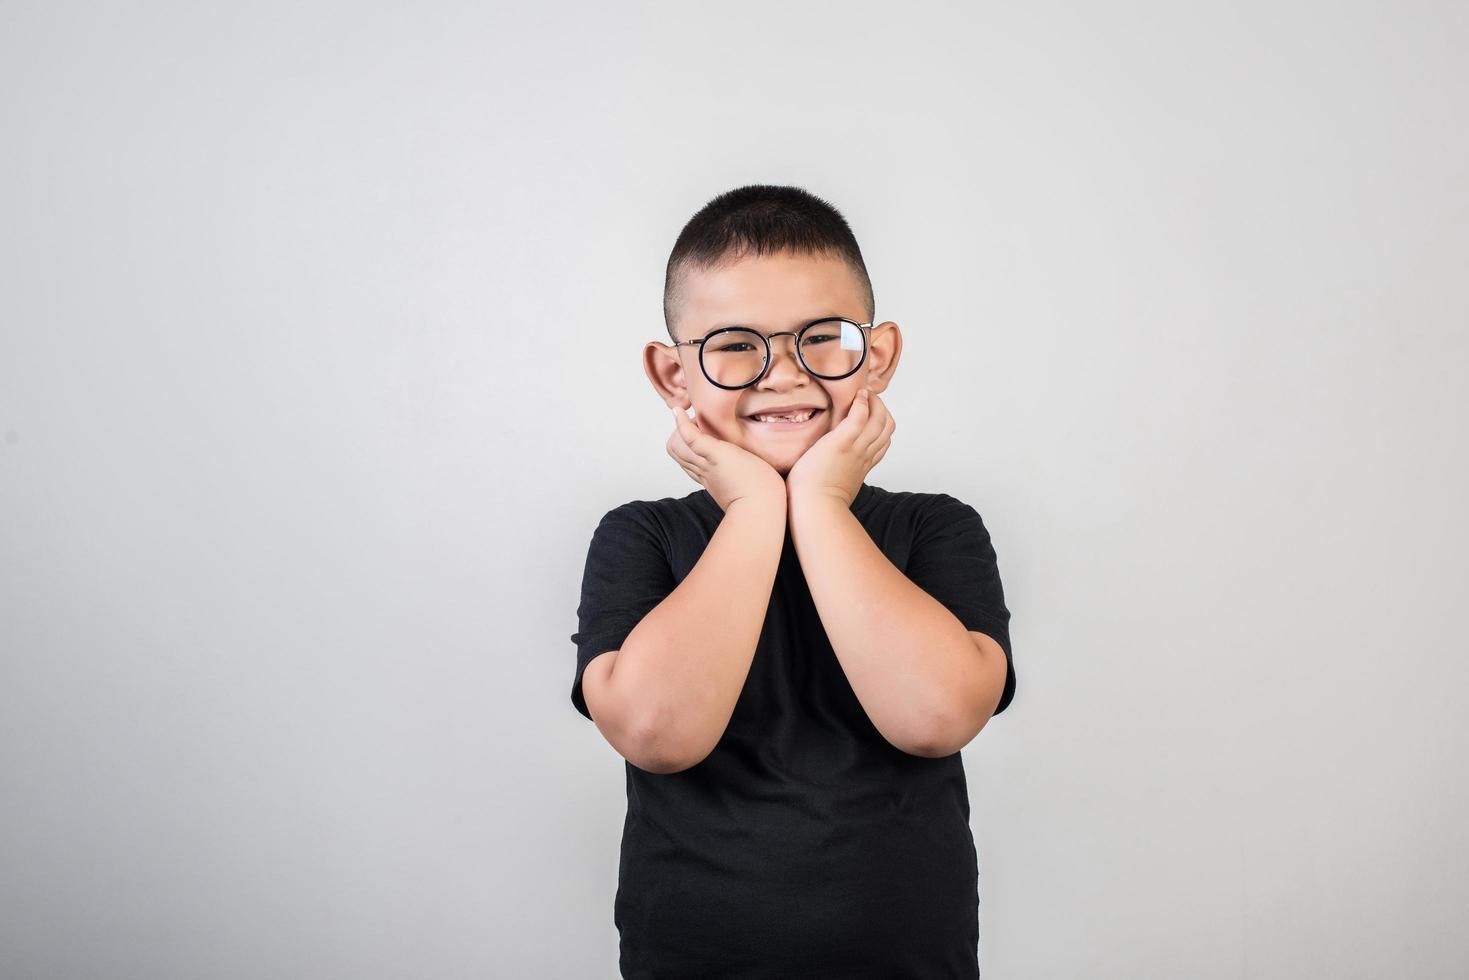 Funny portrait boy studio photo